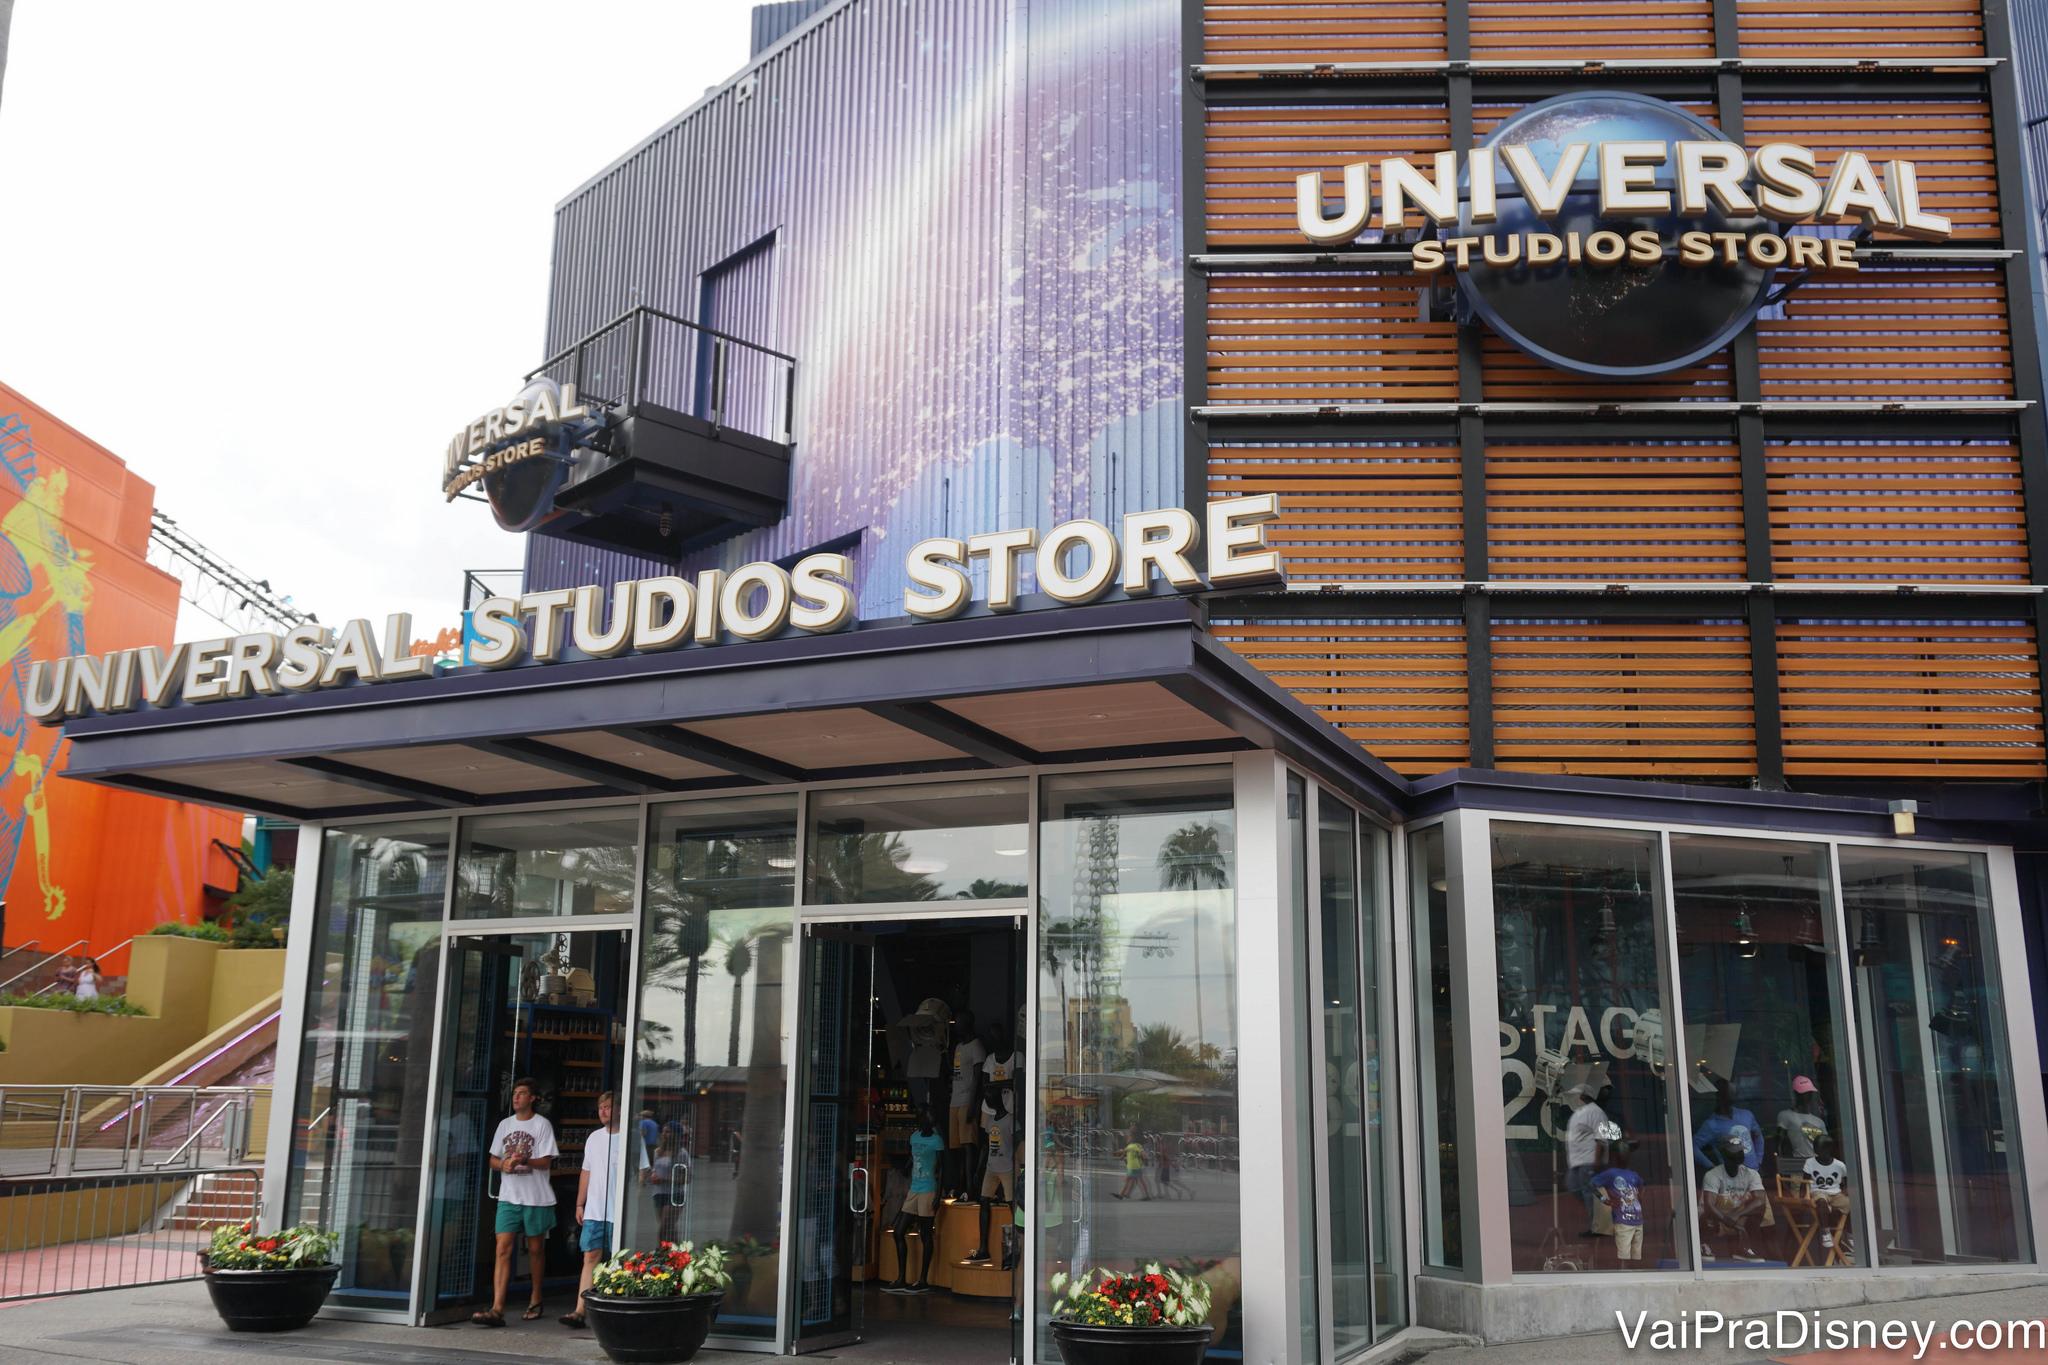 Foto da loja da Universal no CityWalk, a Universal Studios Store